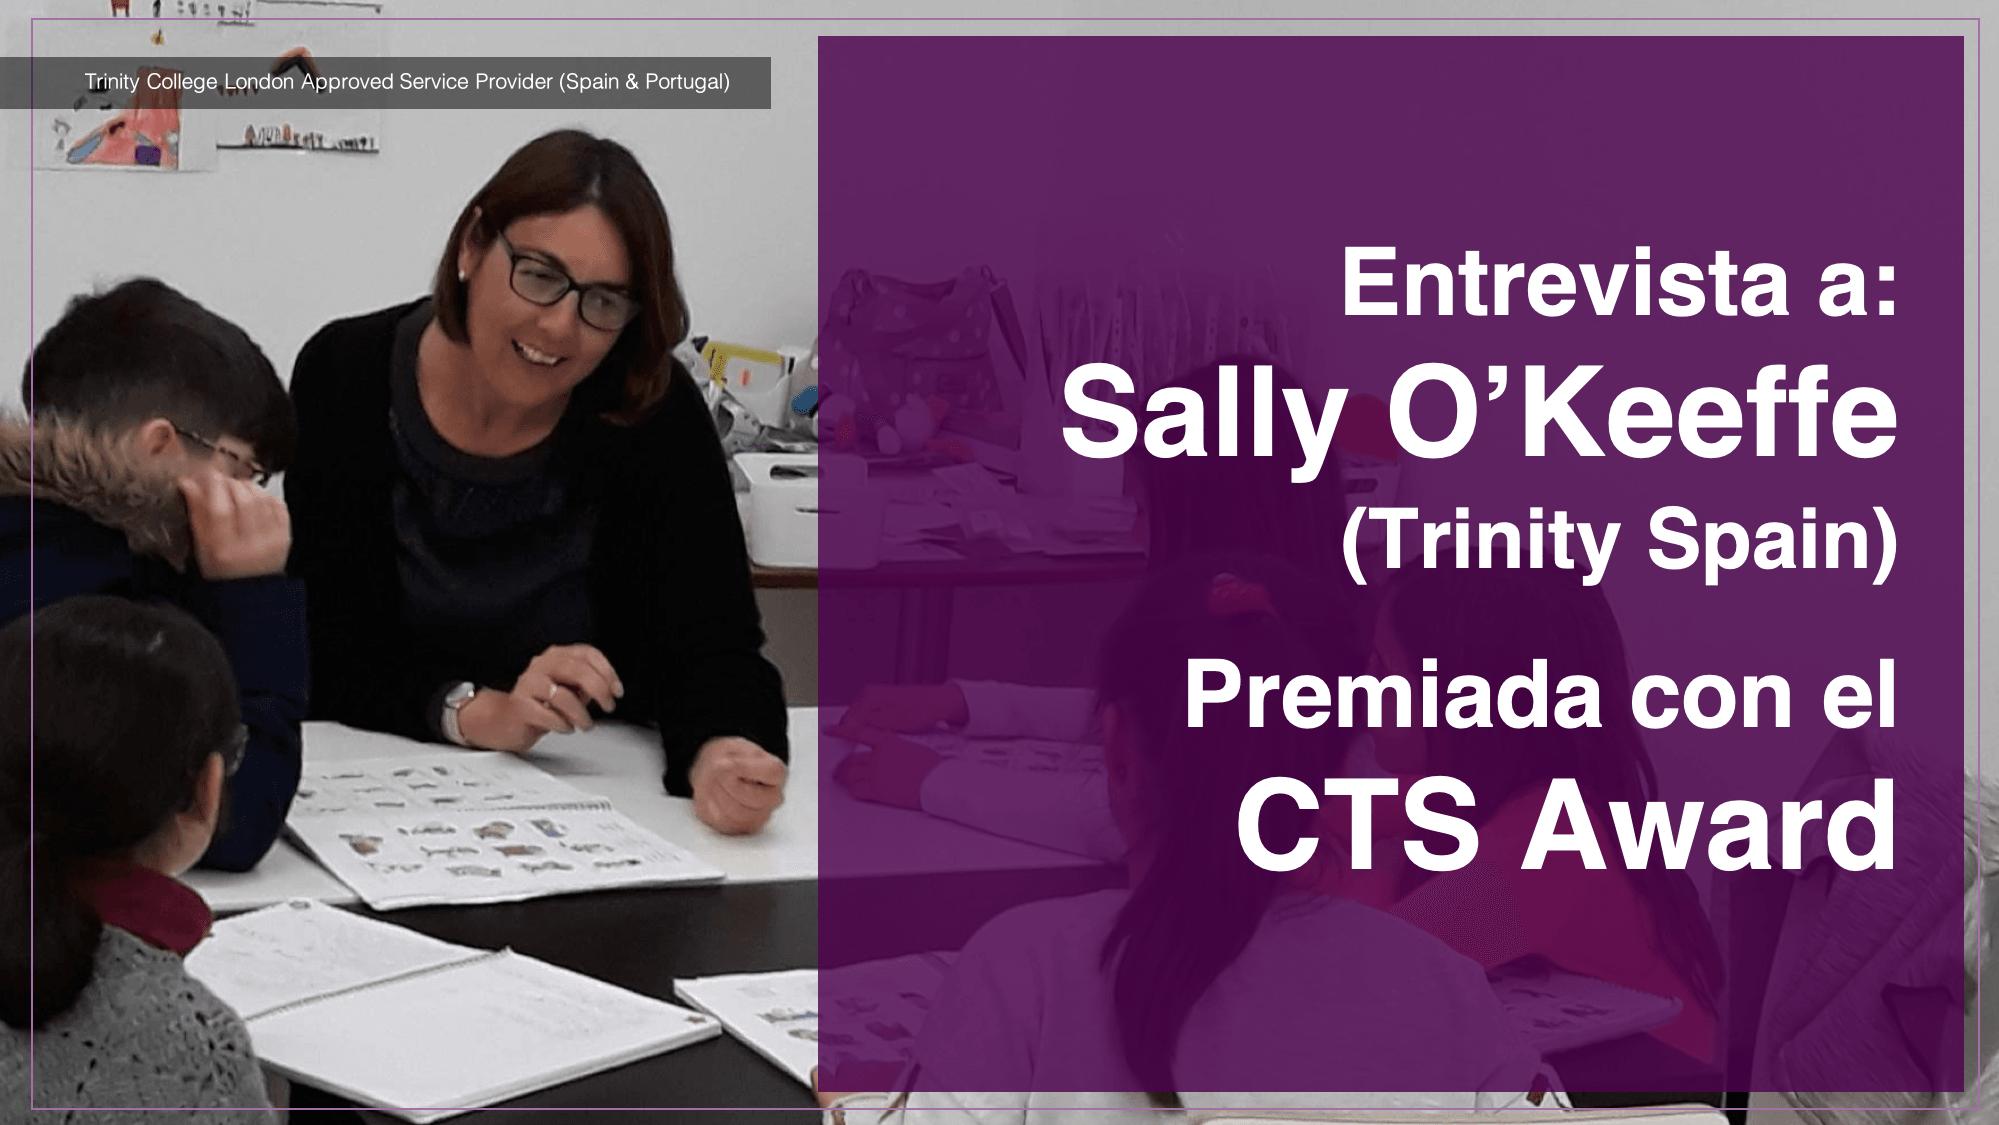 Entrevista a: Sally O'Keeffe (Trinity Spain) Premiada con el CTS Award